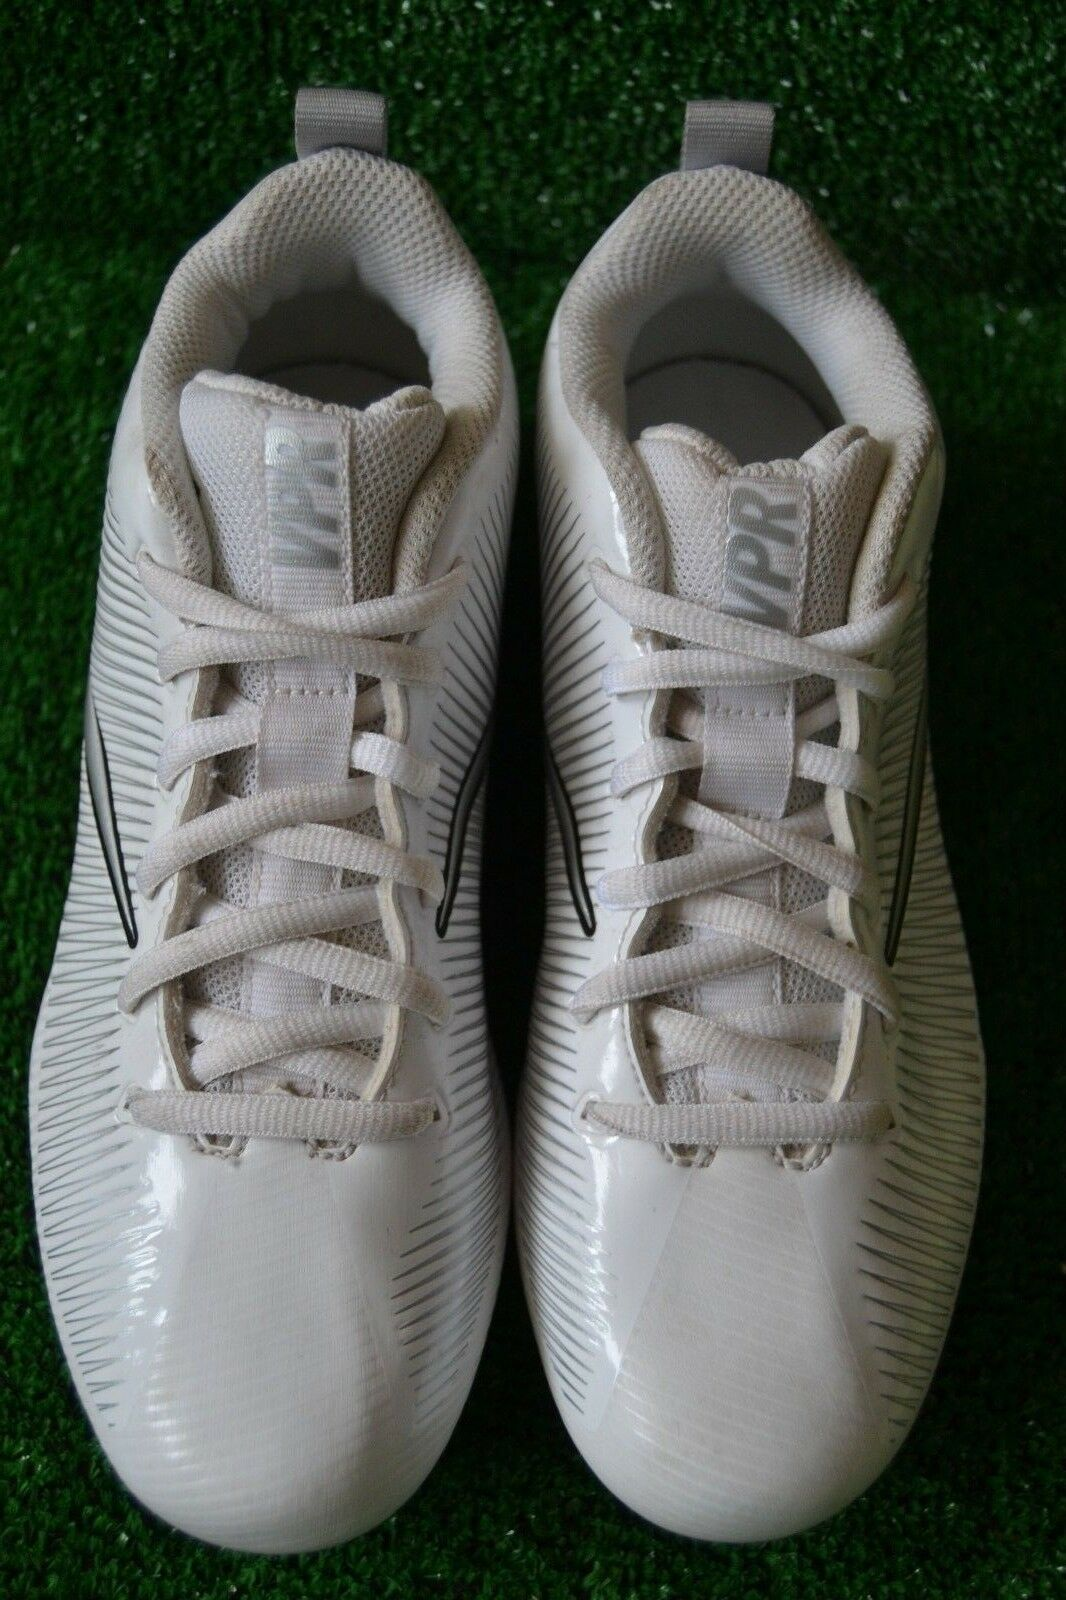 Nuevo Raro Mercurial Vapor Junior Nike Botines De Fútbol botas Tamaño 4.5UK-37.5EU